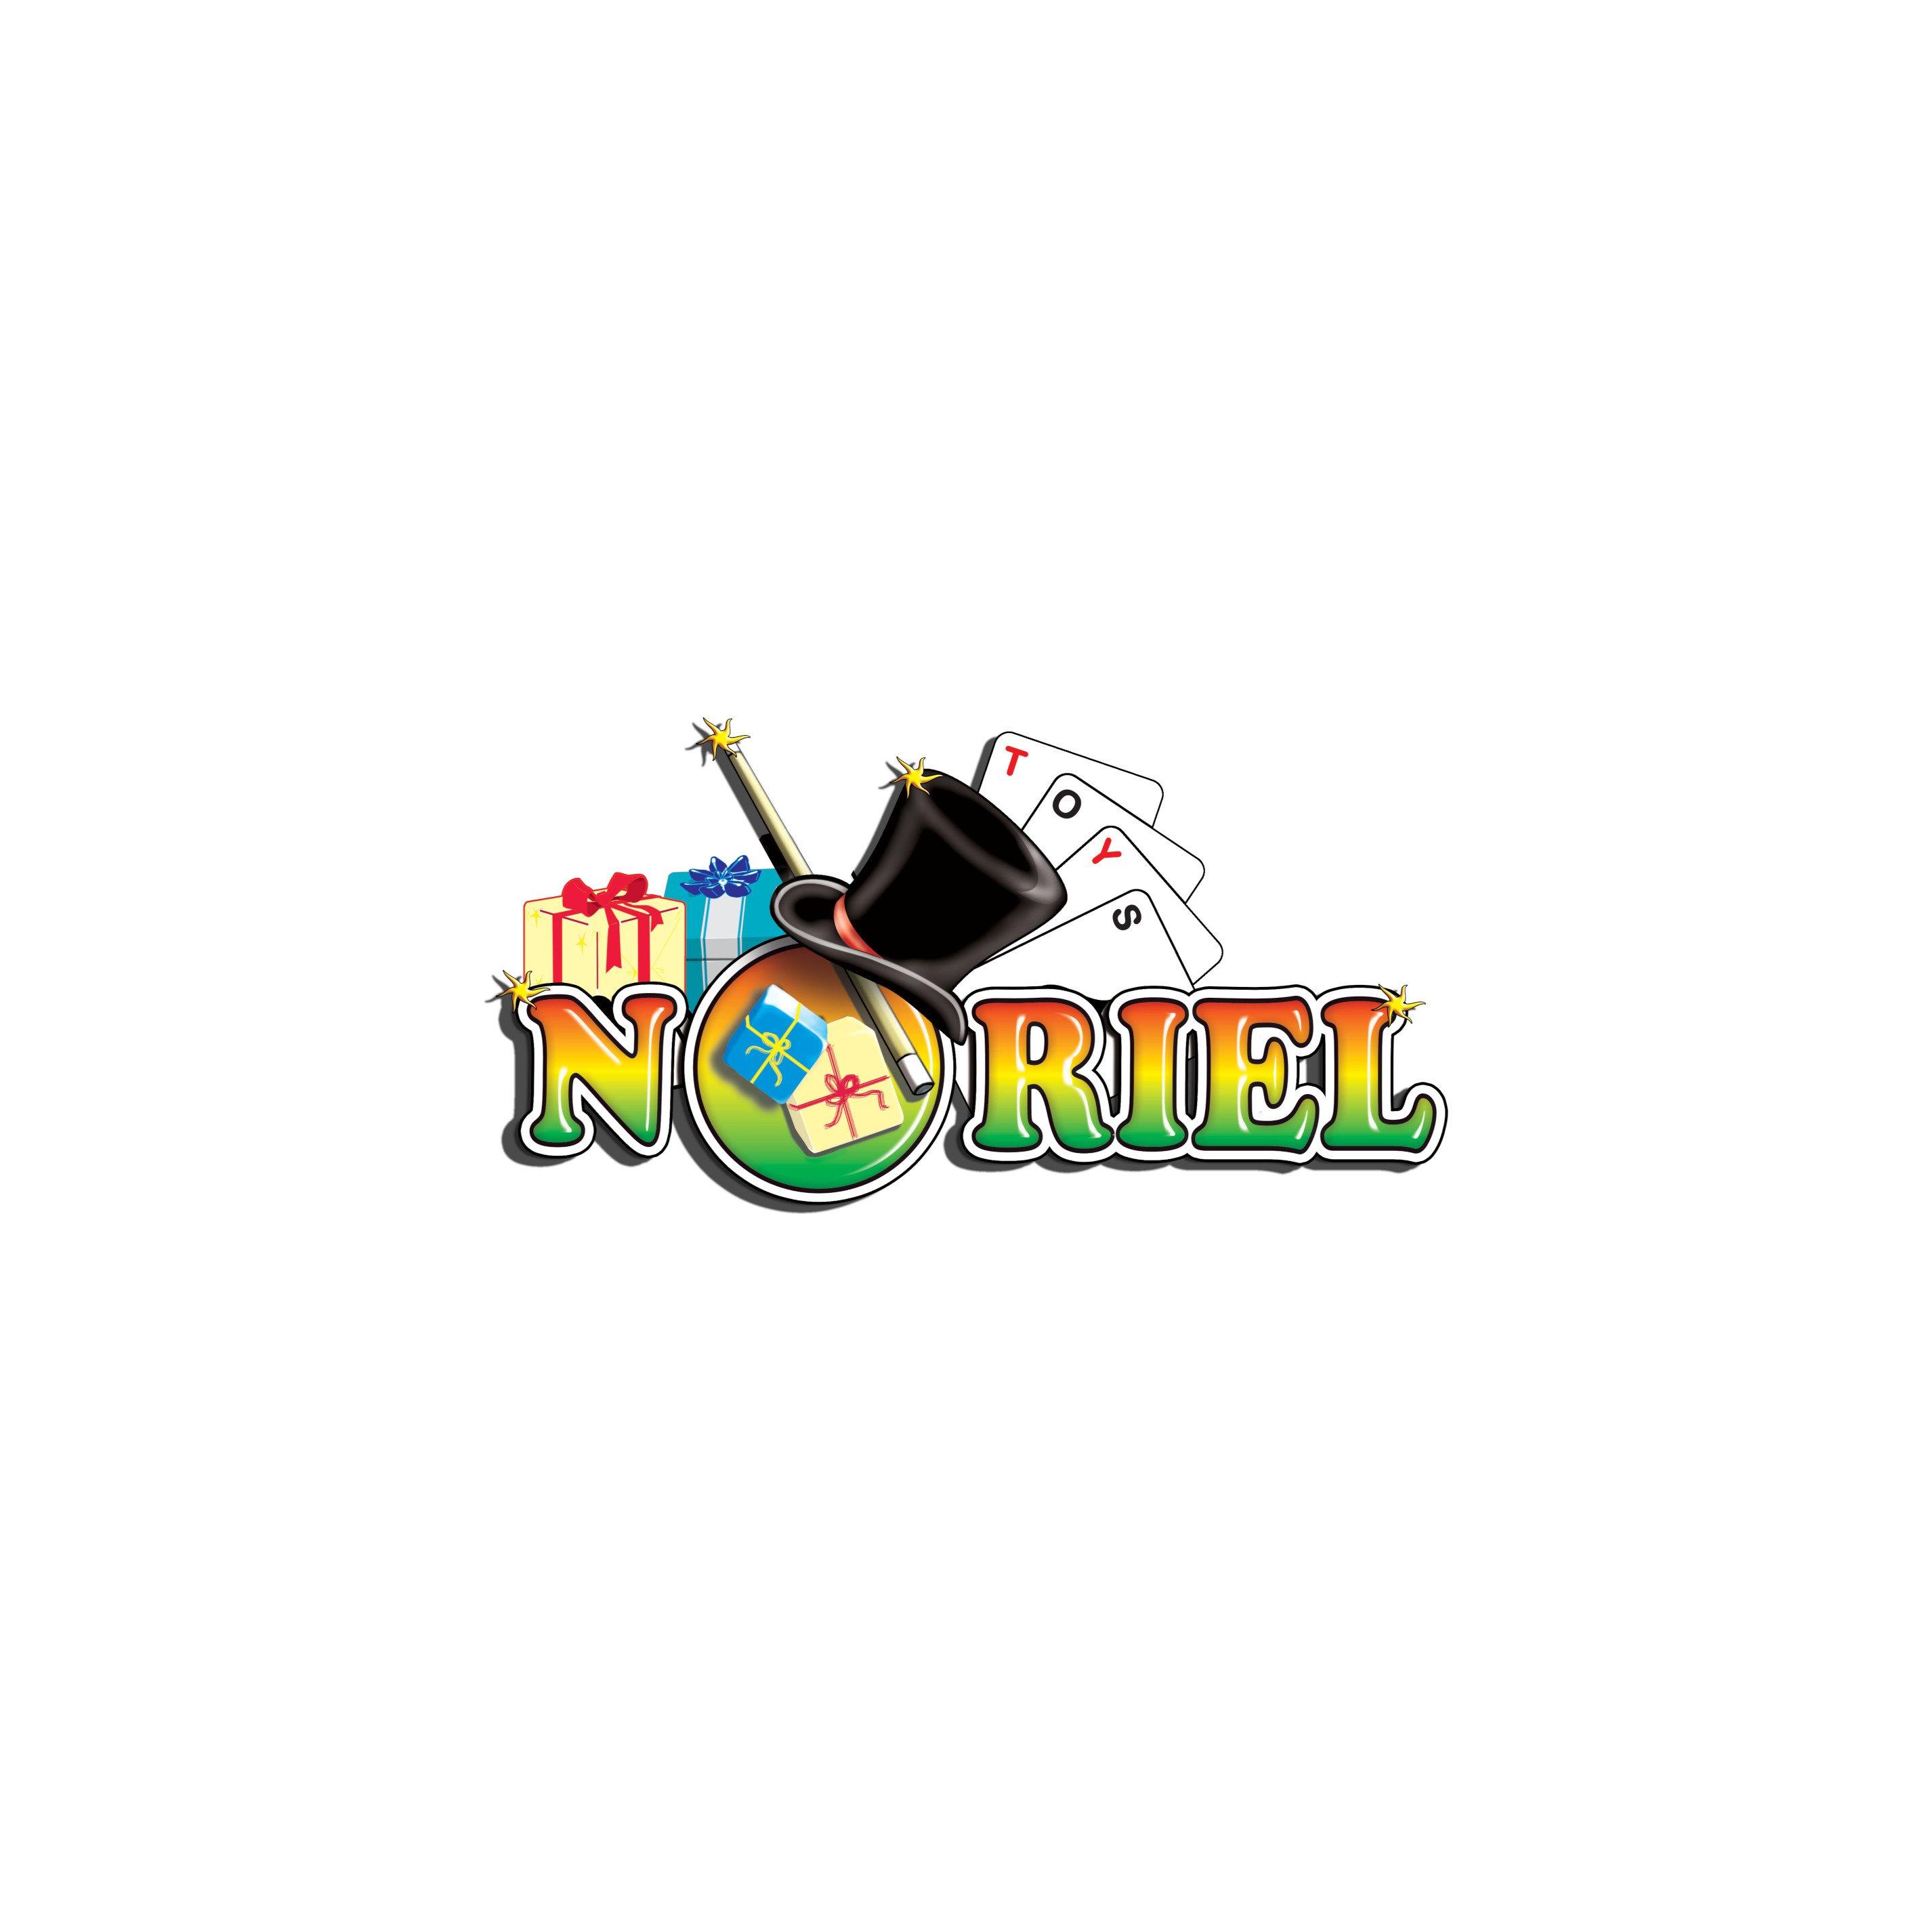 FJH11_2018_001w Set de joaca Enchantimals - Fruit Cart & Monkey, FCG93